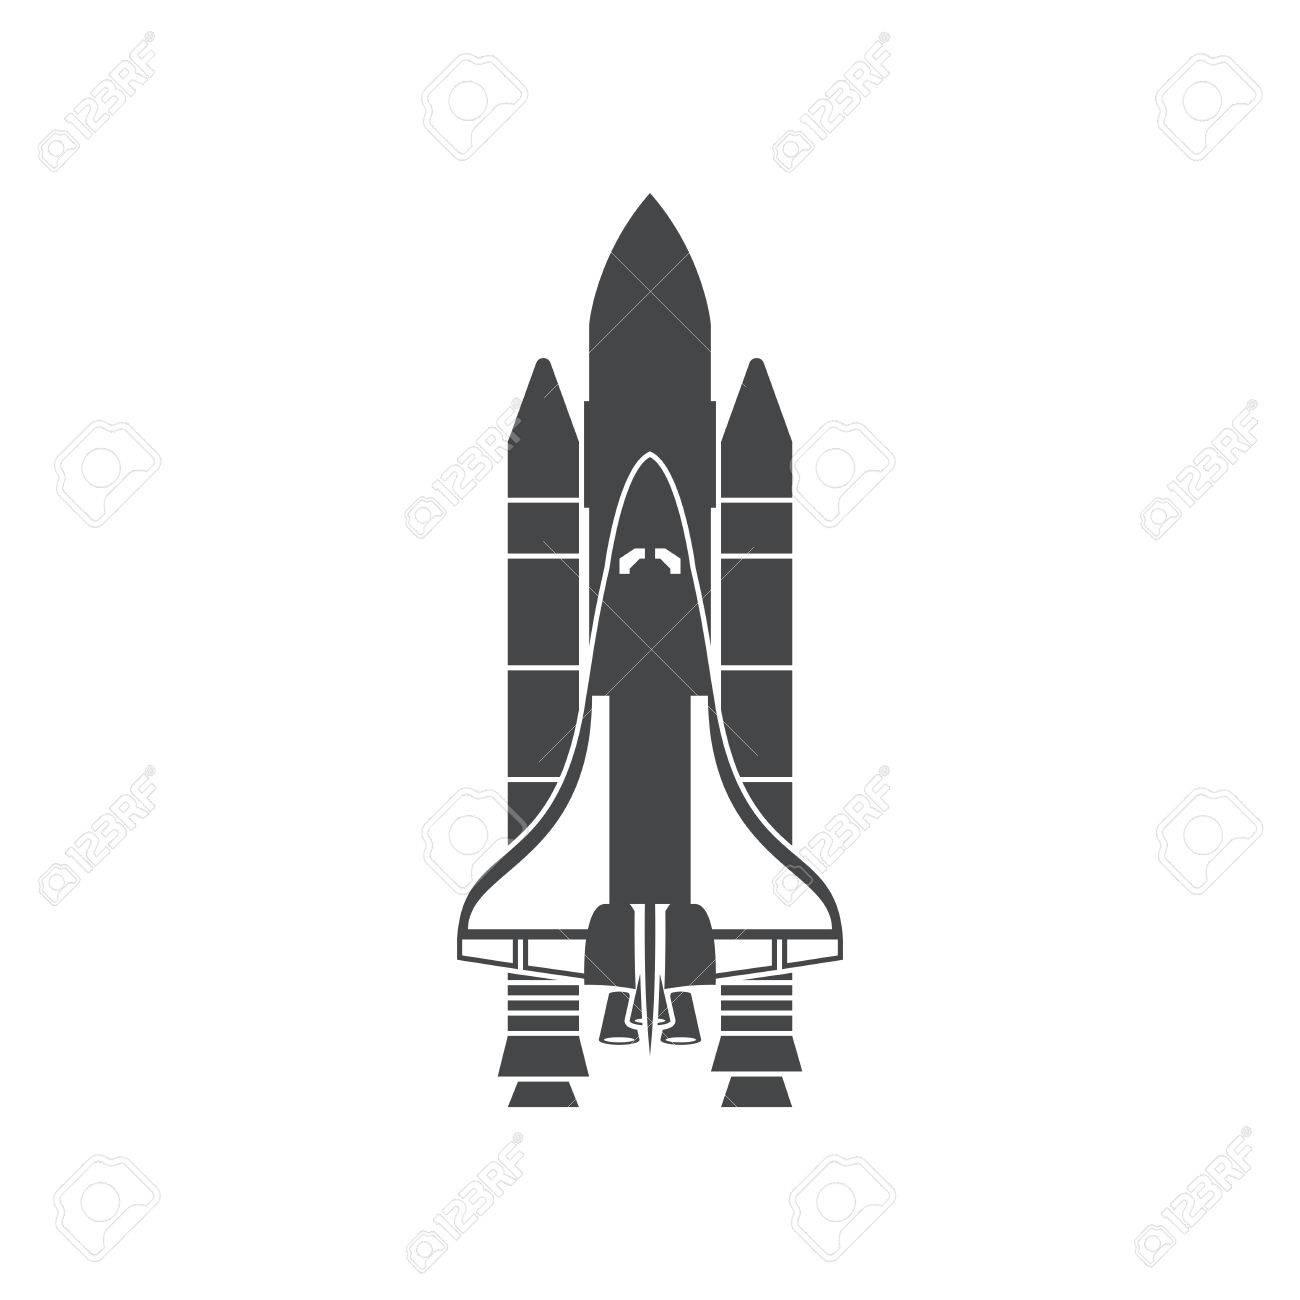 space shuttle silhouette vector illustration isolated on white rh 123rf com space shuttle vector logo nasa space shuttle vector